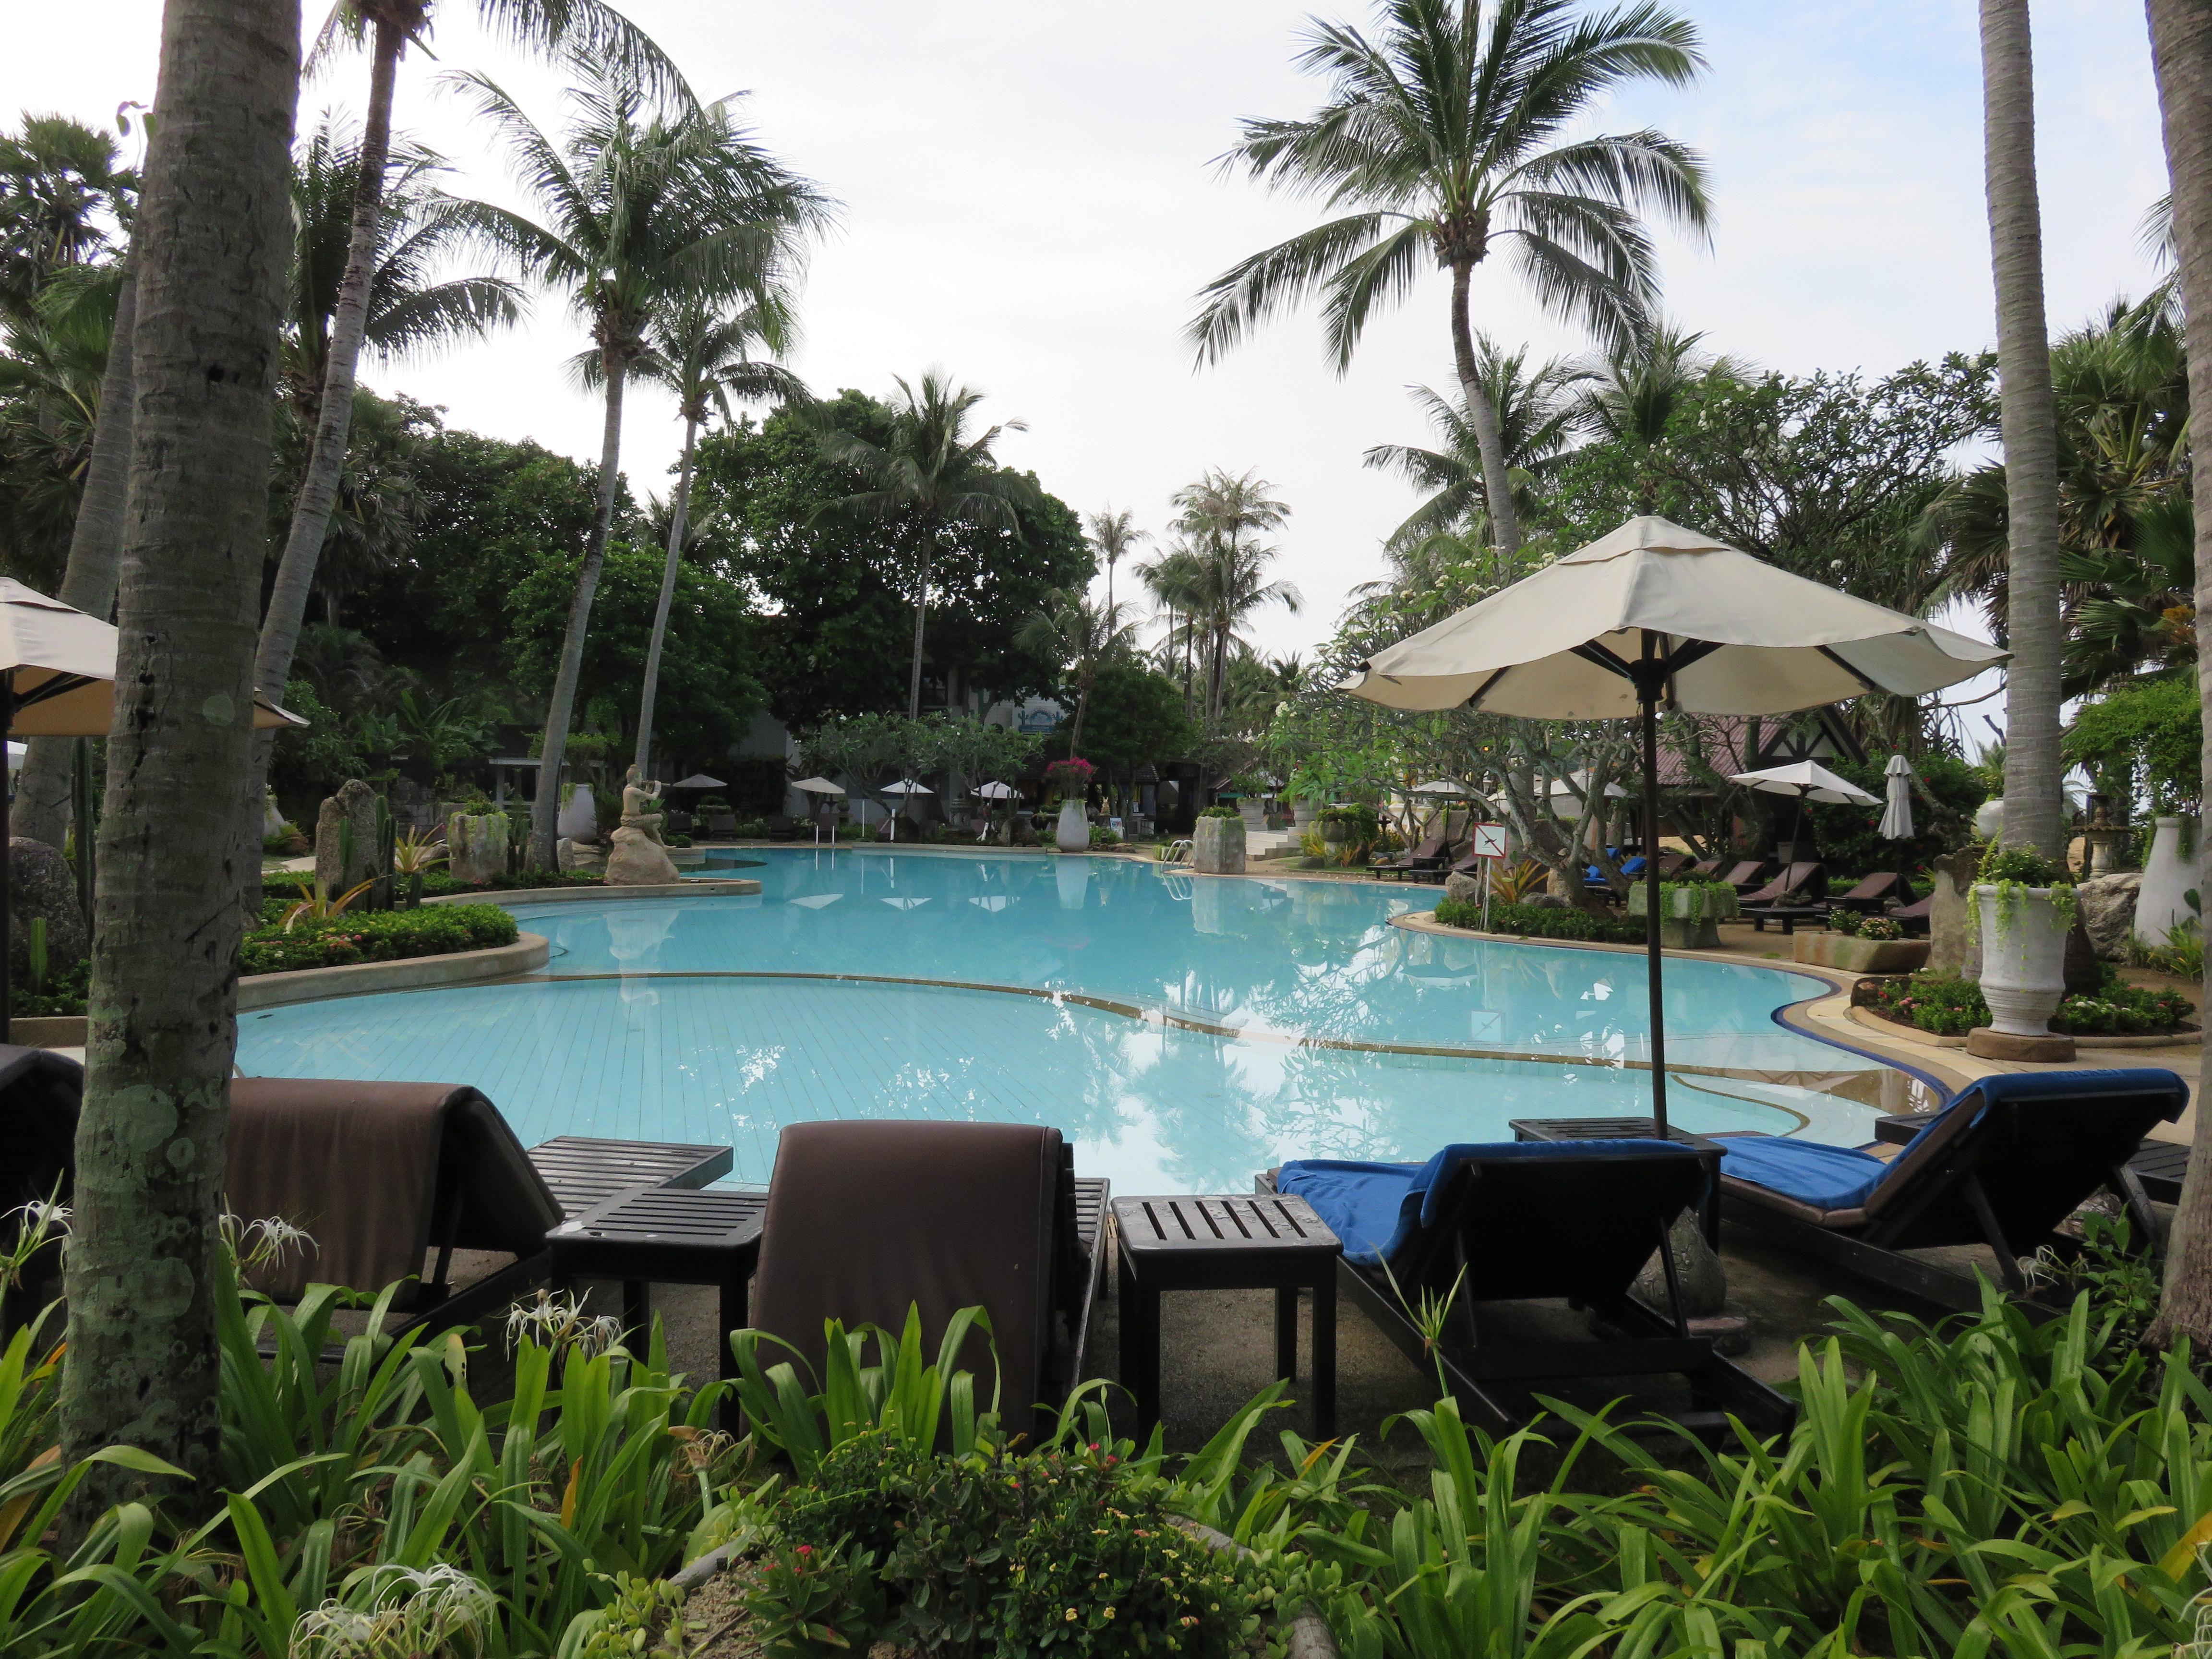 thavornpalmbeachresort(普吉岛塔夫棕榈别墅度假村)巴厘岛海滩满月图片